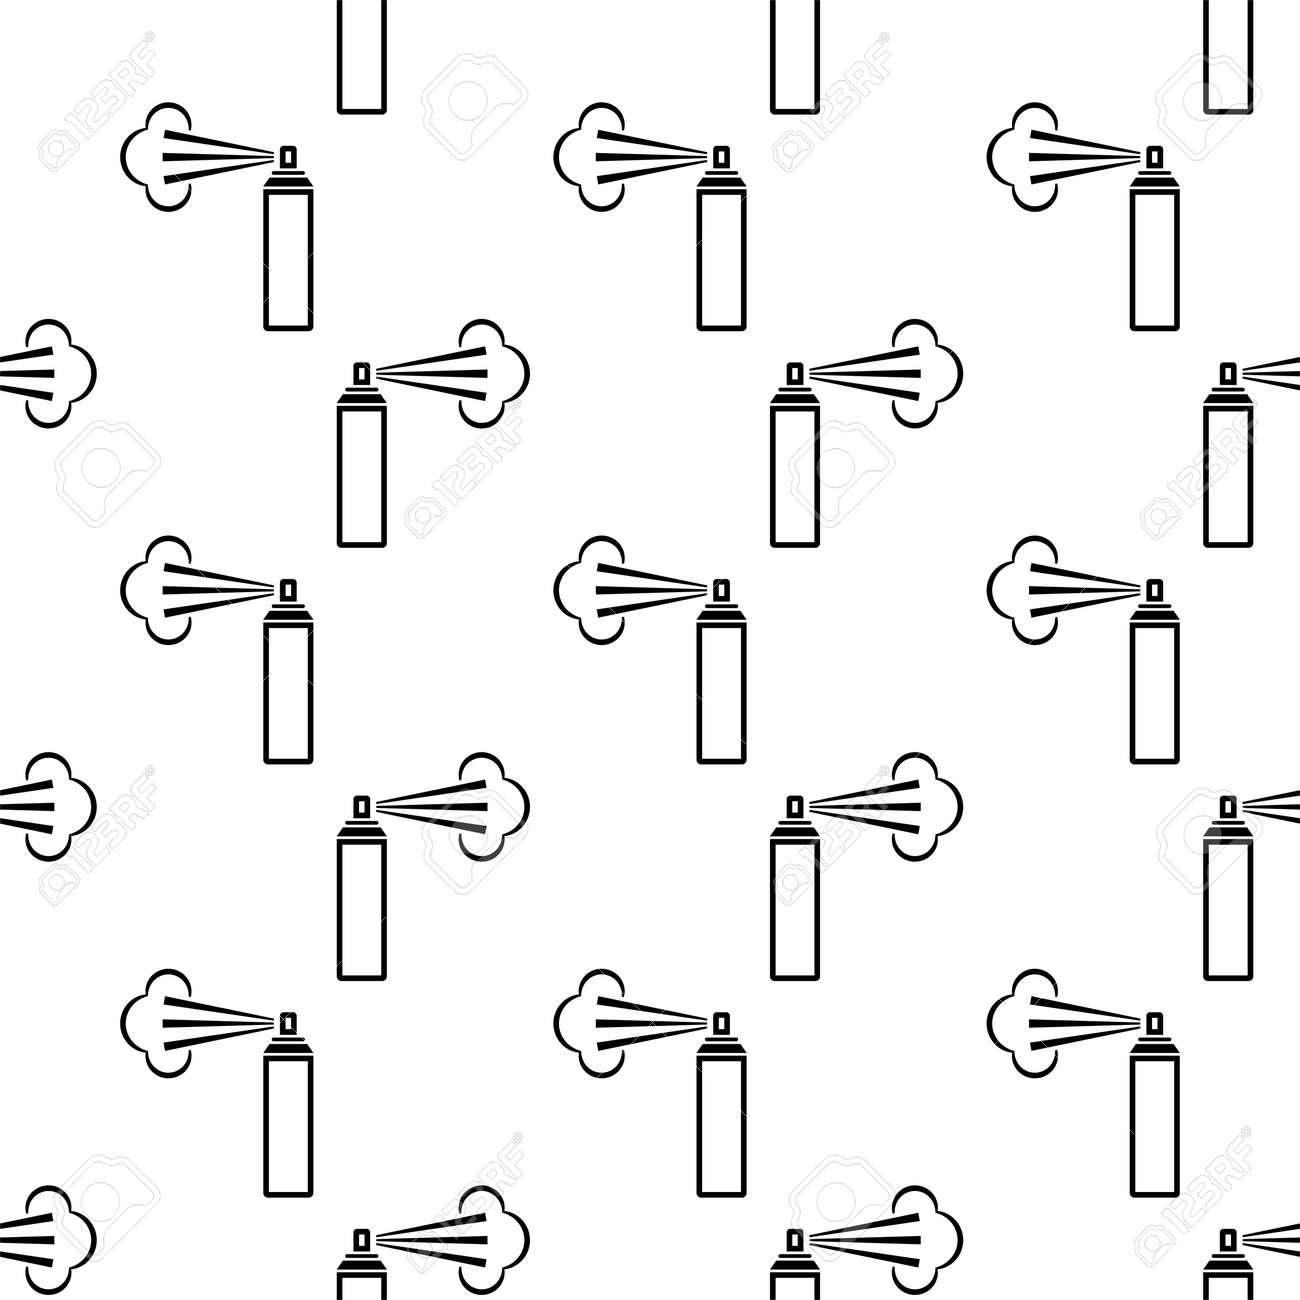 Aerosol Fluid Spray Cloud Icon Seamless Pattern Vector Art Illustration - 149571087